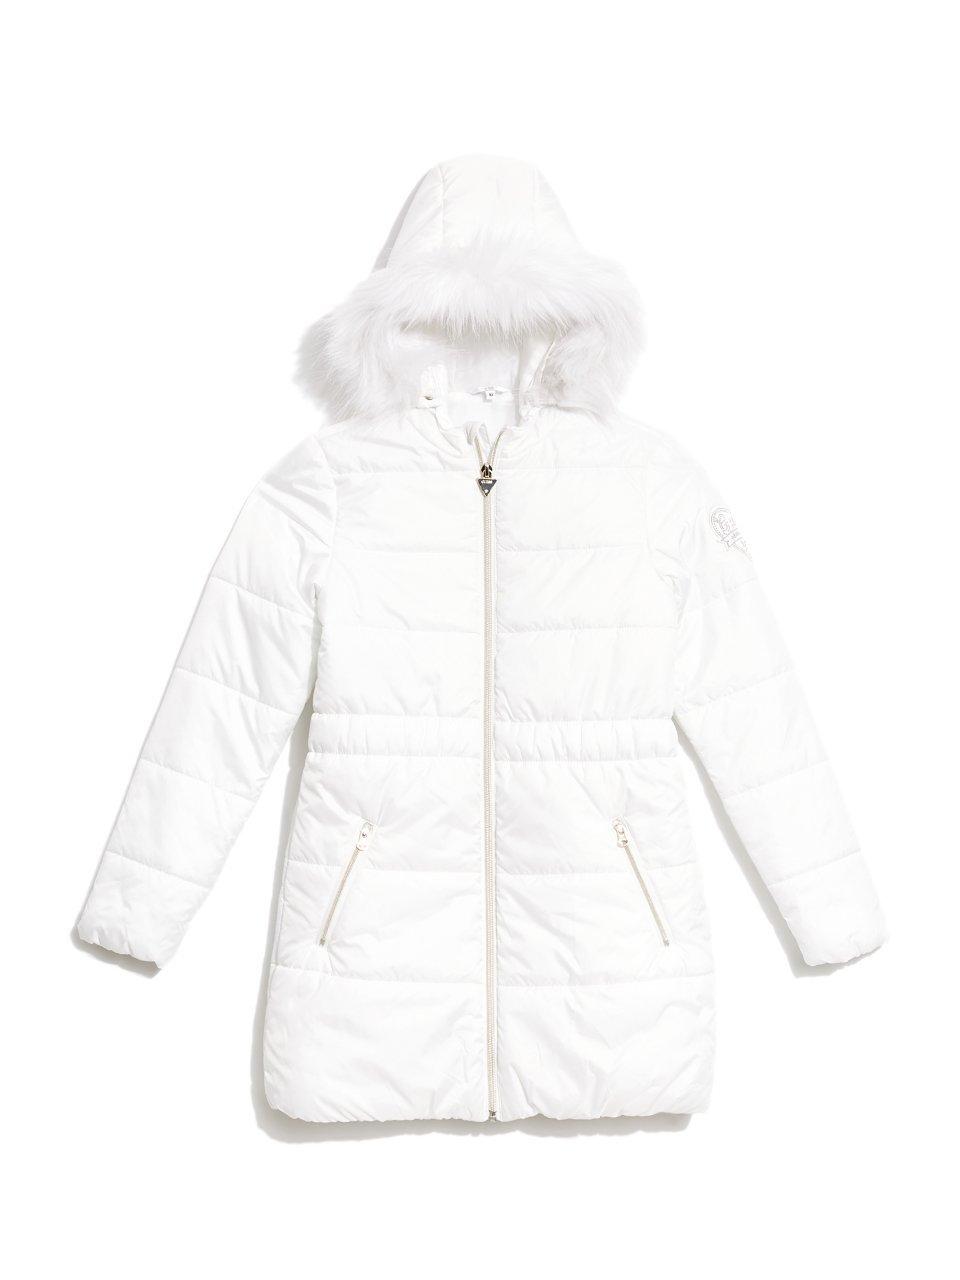 GUESS Girl's Puffer Coat (7-16)